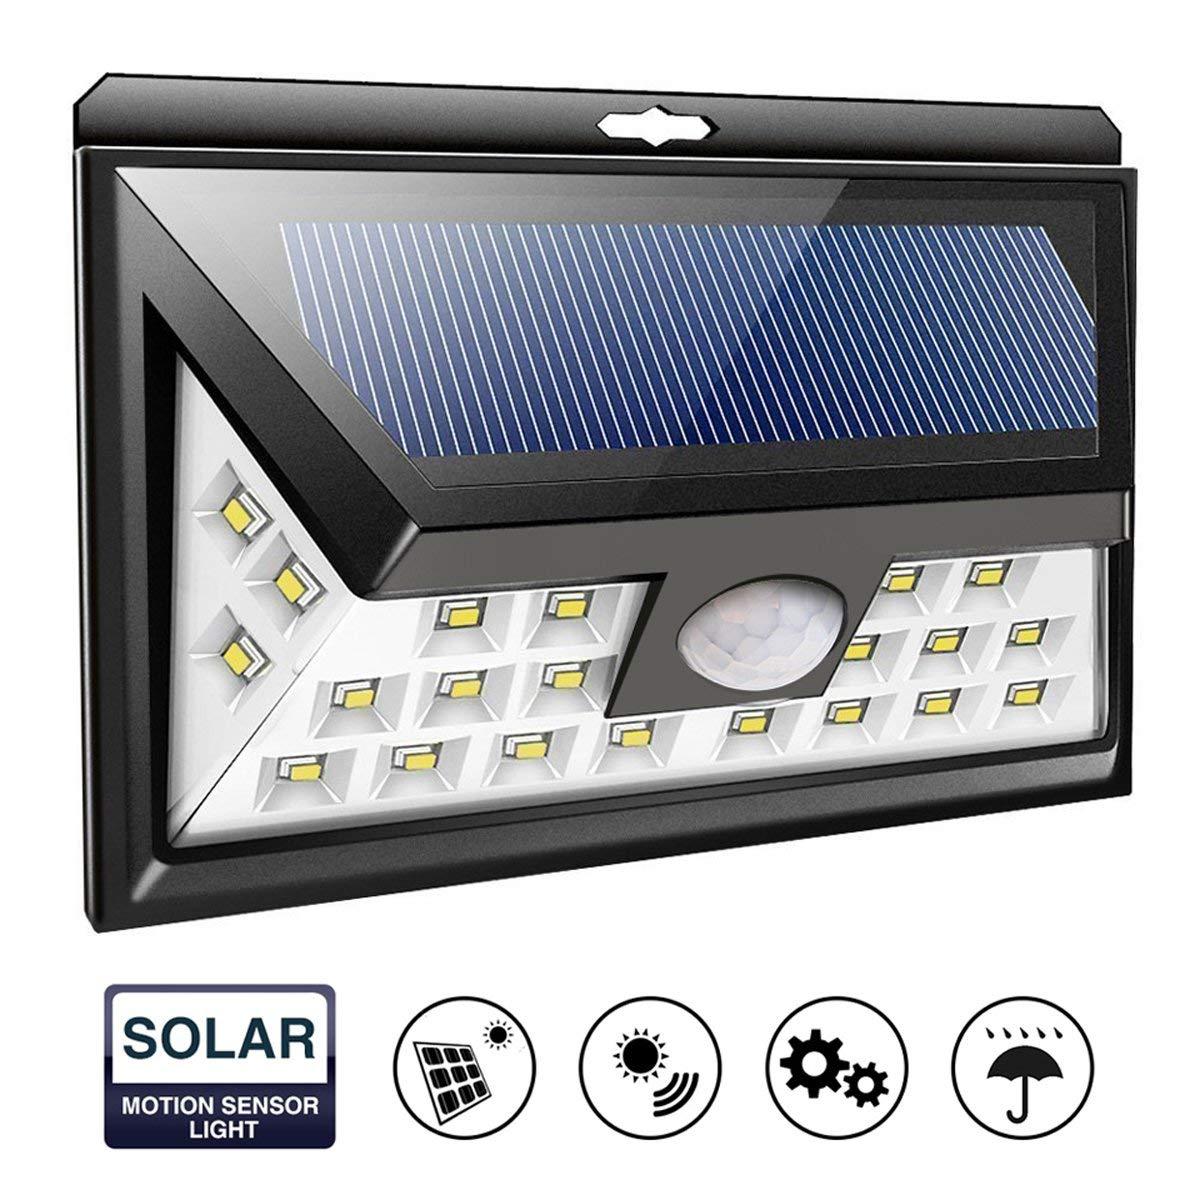 Solar Outdoor Lights 24 Led Solar Light Energy Super Bright Security Motion Sensor Wall Lamp Waterproof IP65 Yard Light